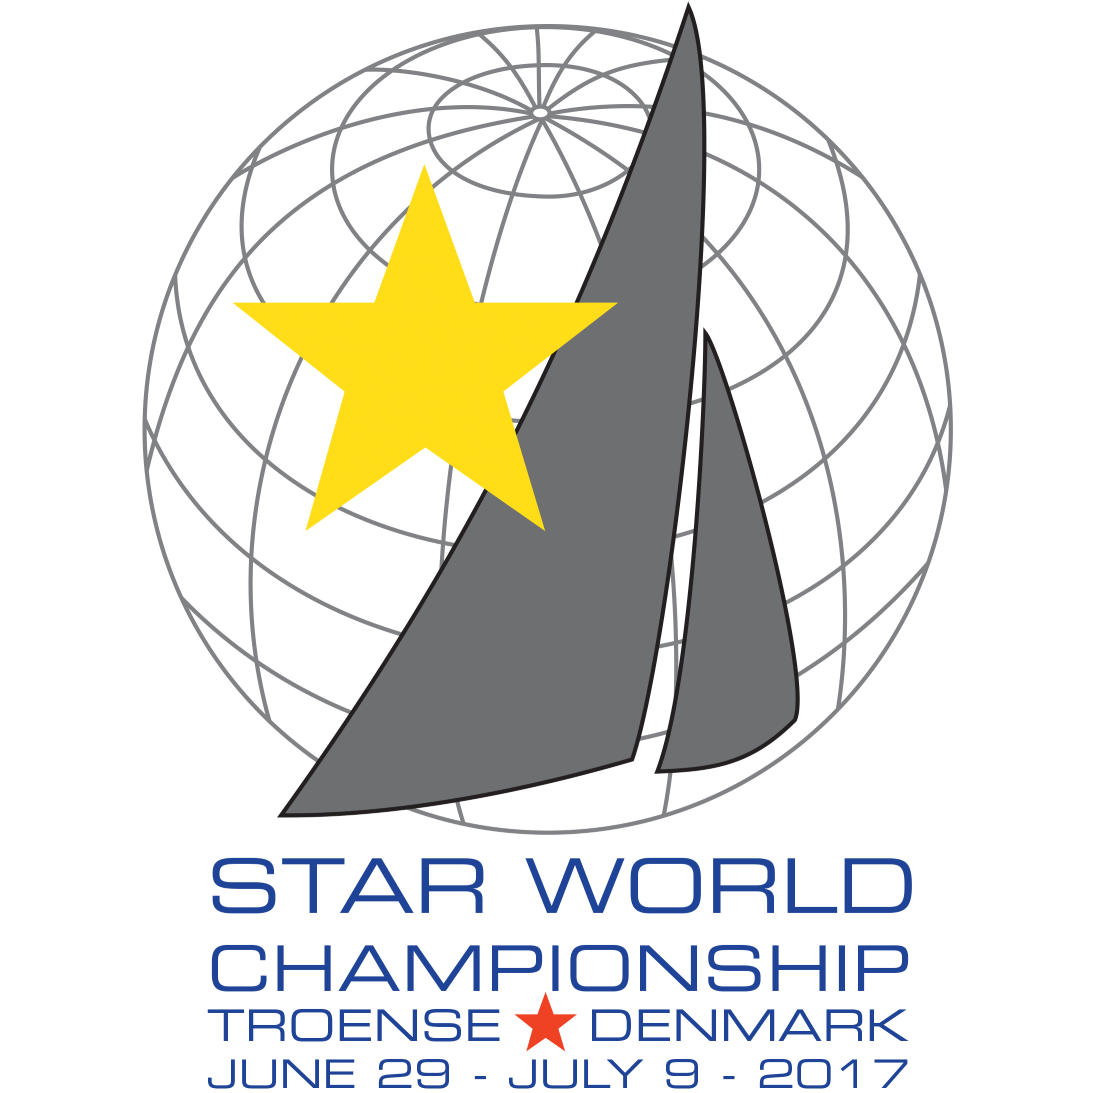 2017 Star World Championships